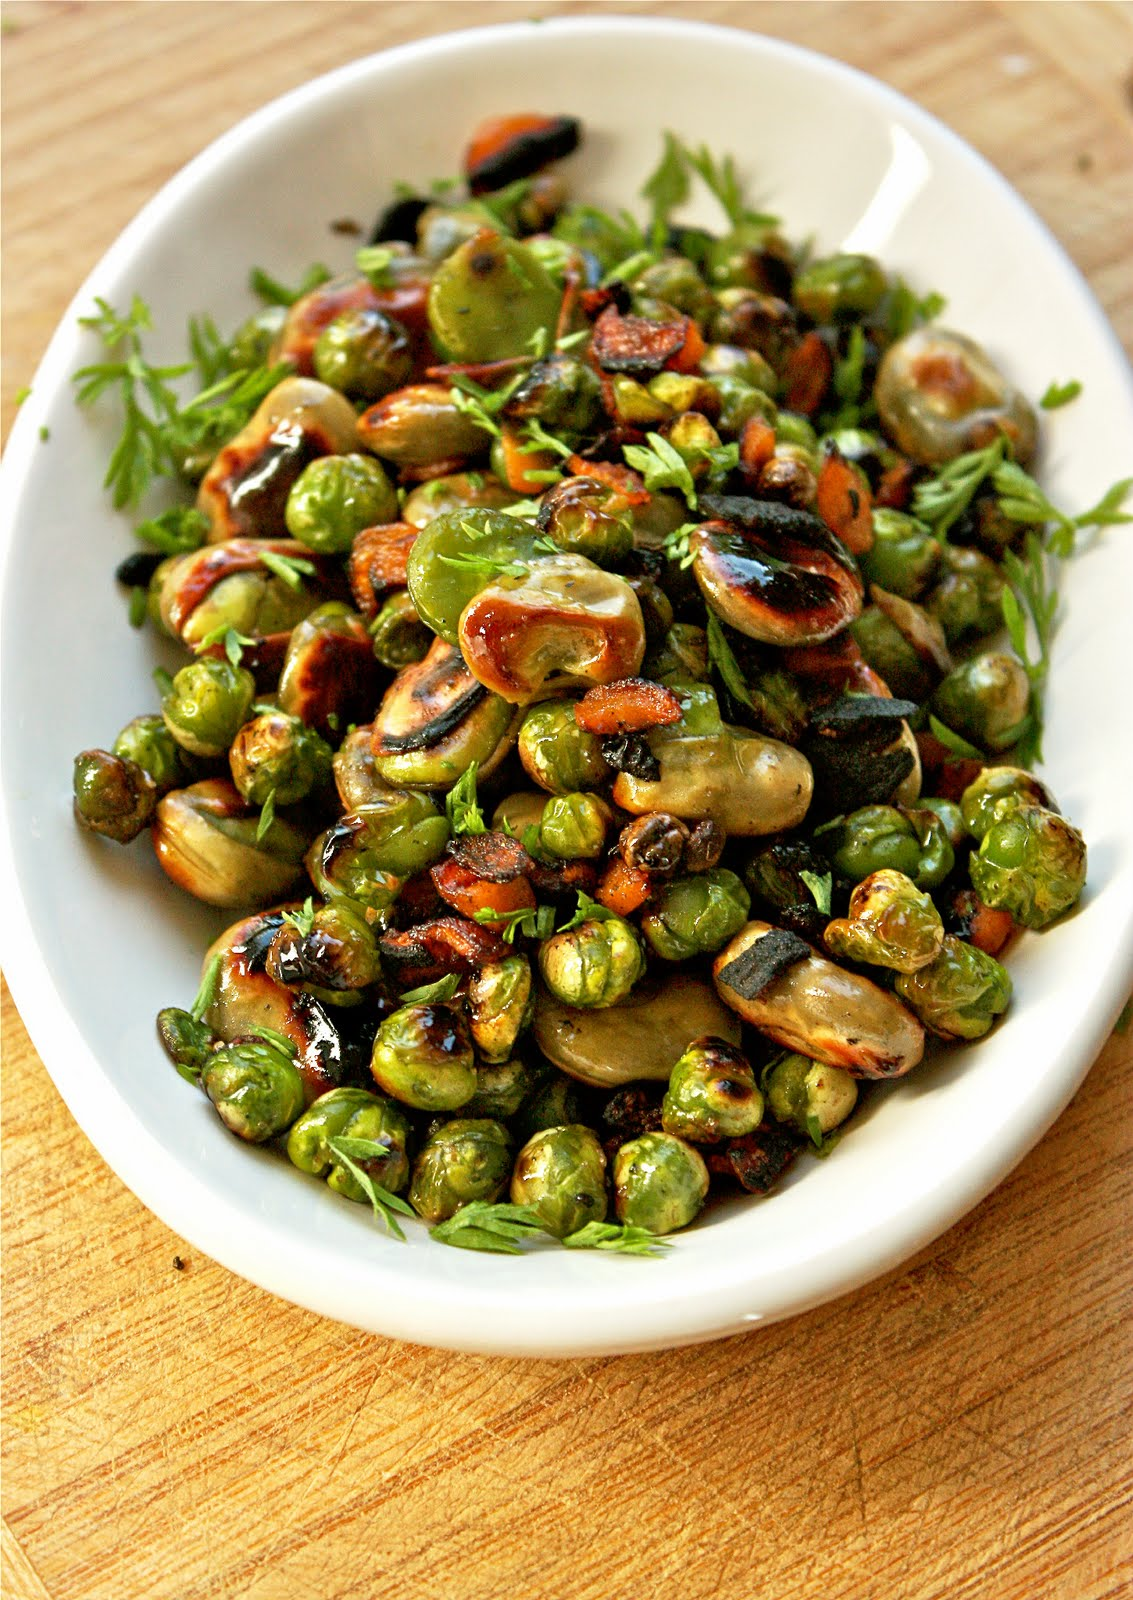 Sreelus Tasty Travels: Quinoa Salad loaded with Fava beans ...